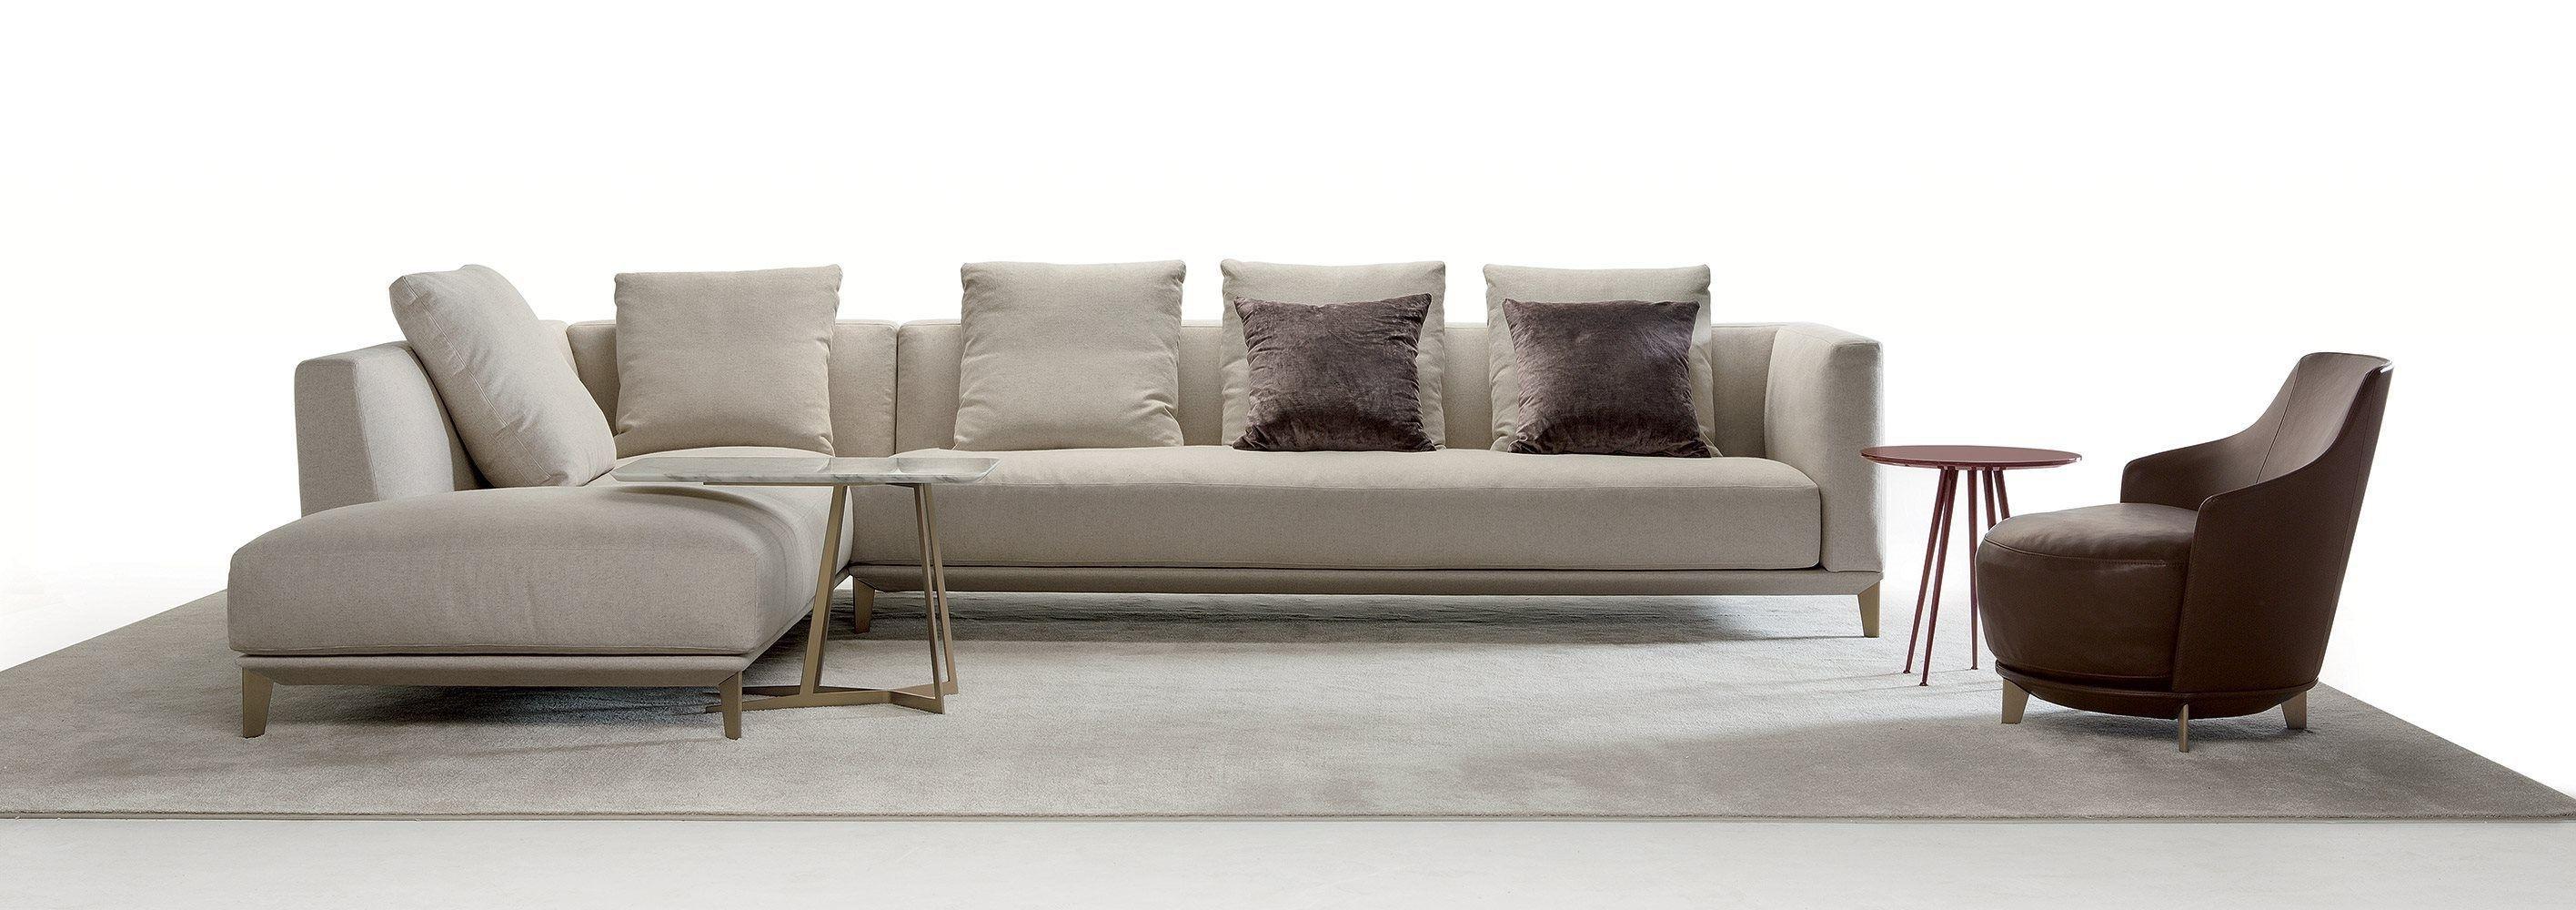 Corner Sofa / Modular / Contemporary / Fabric – Dylancastello Regarding 2017 Contemporary Fabric Sofas (View 13 of 15)